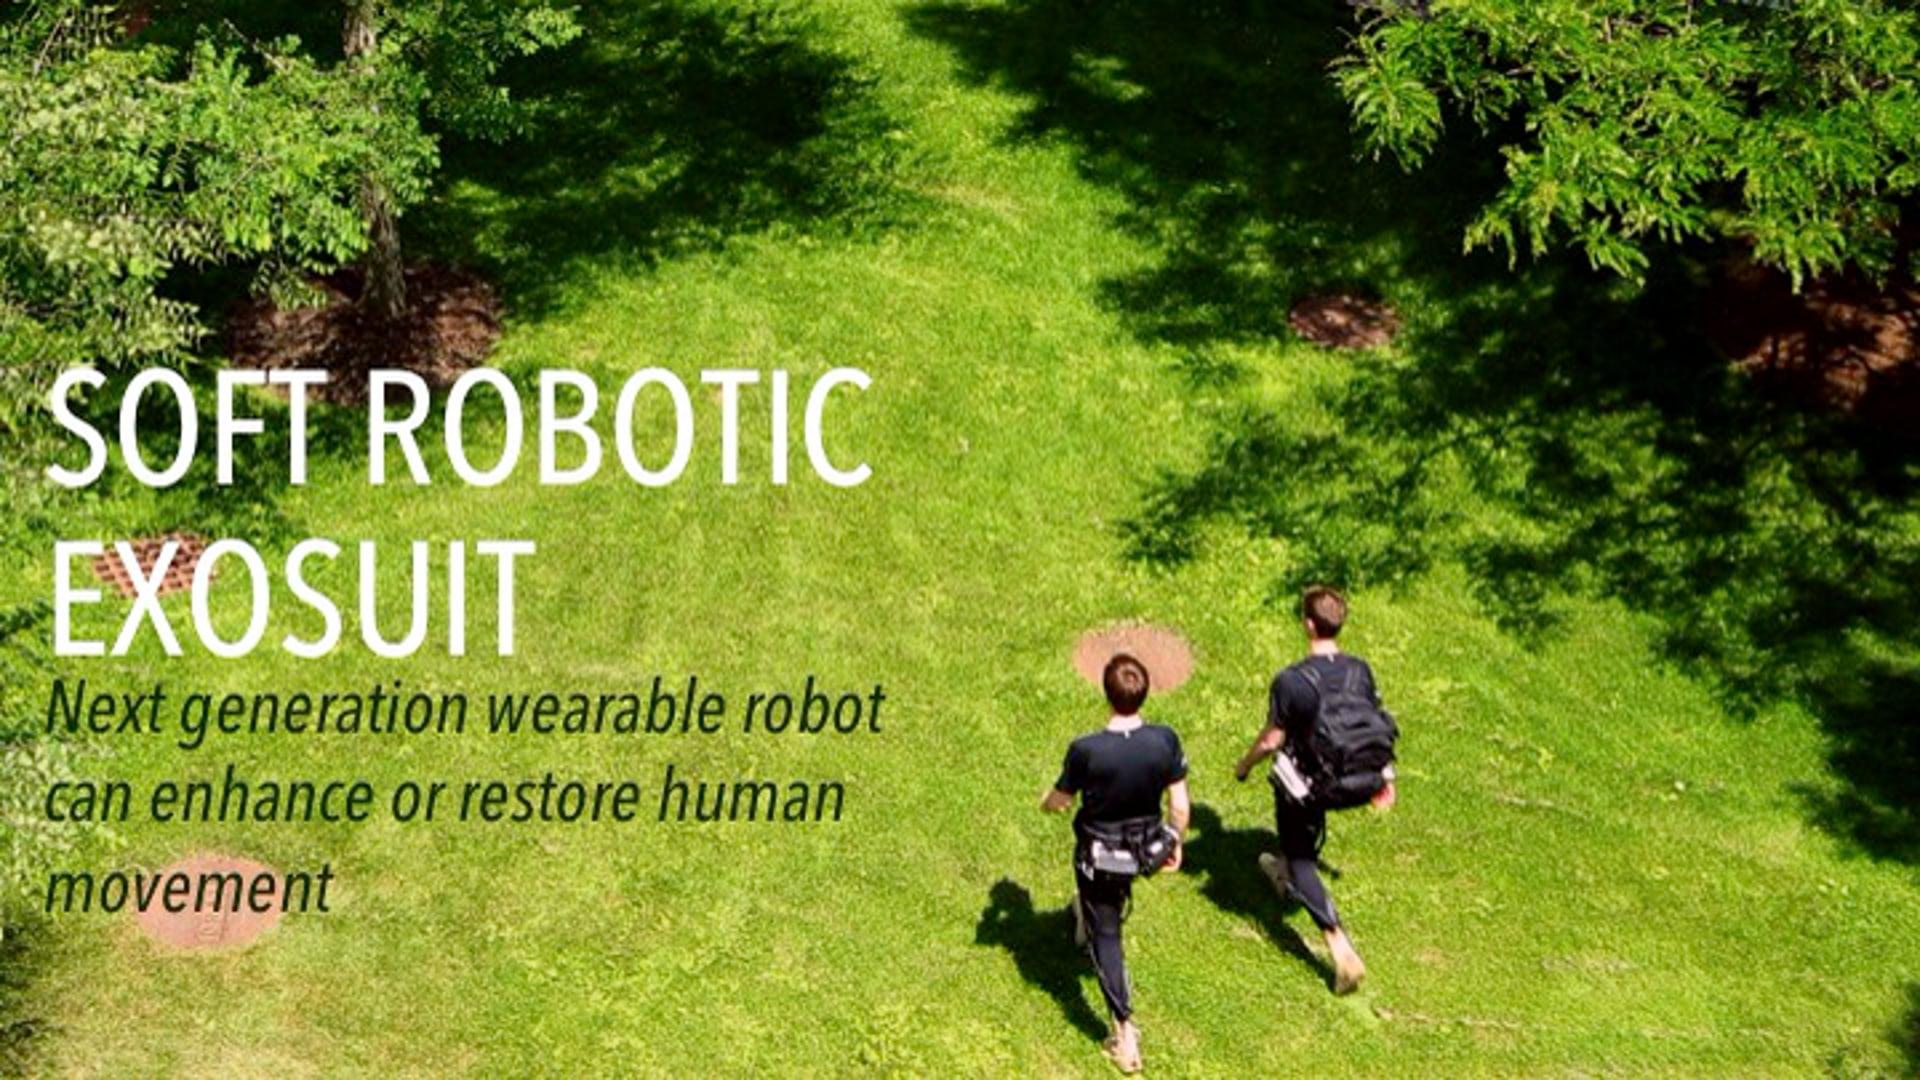 Soft Robotic Exosuit